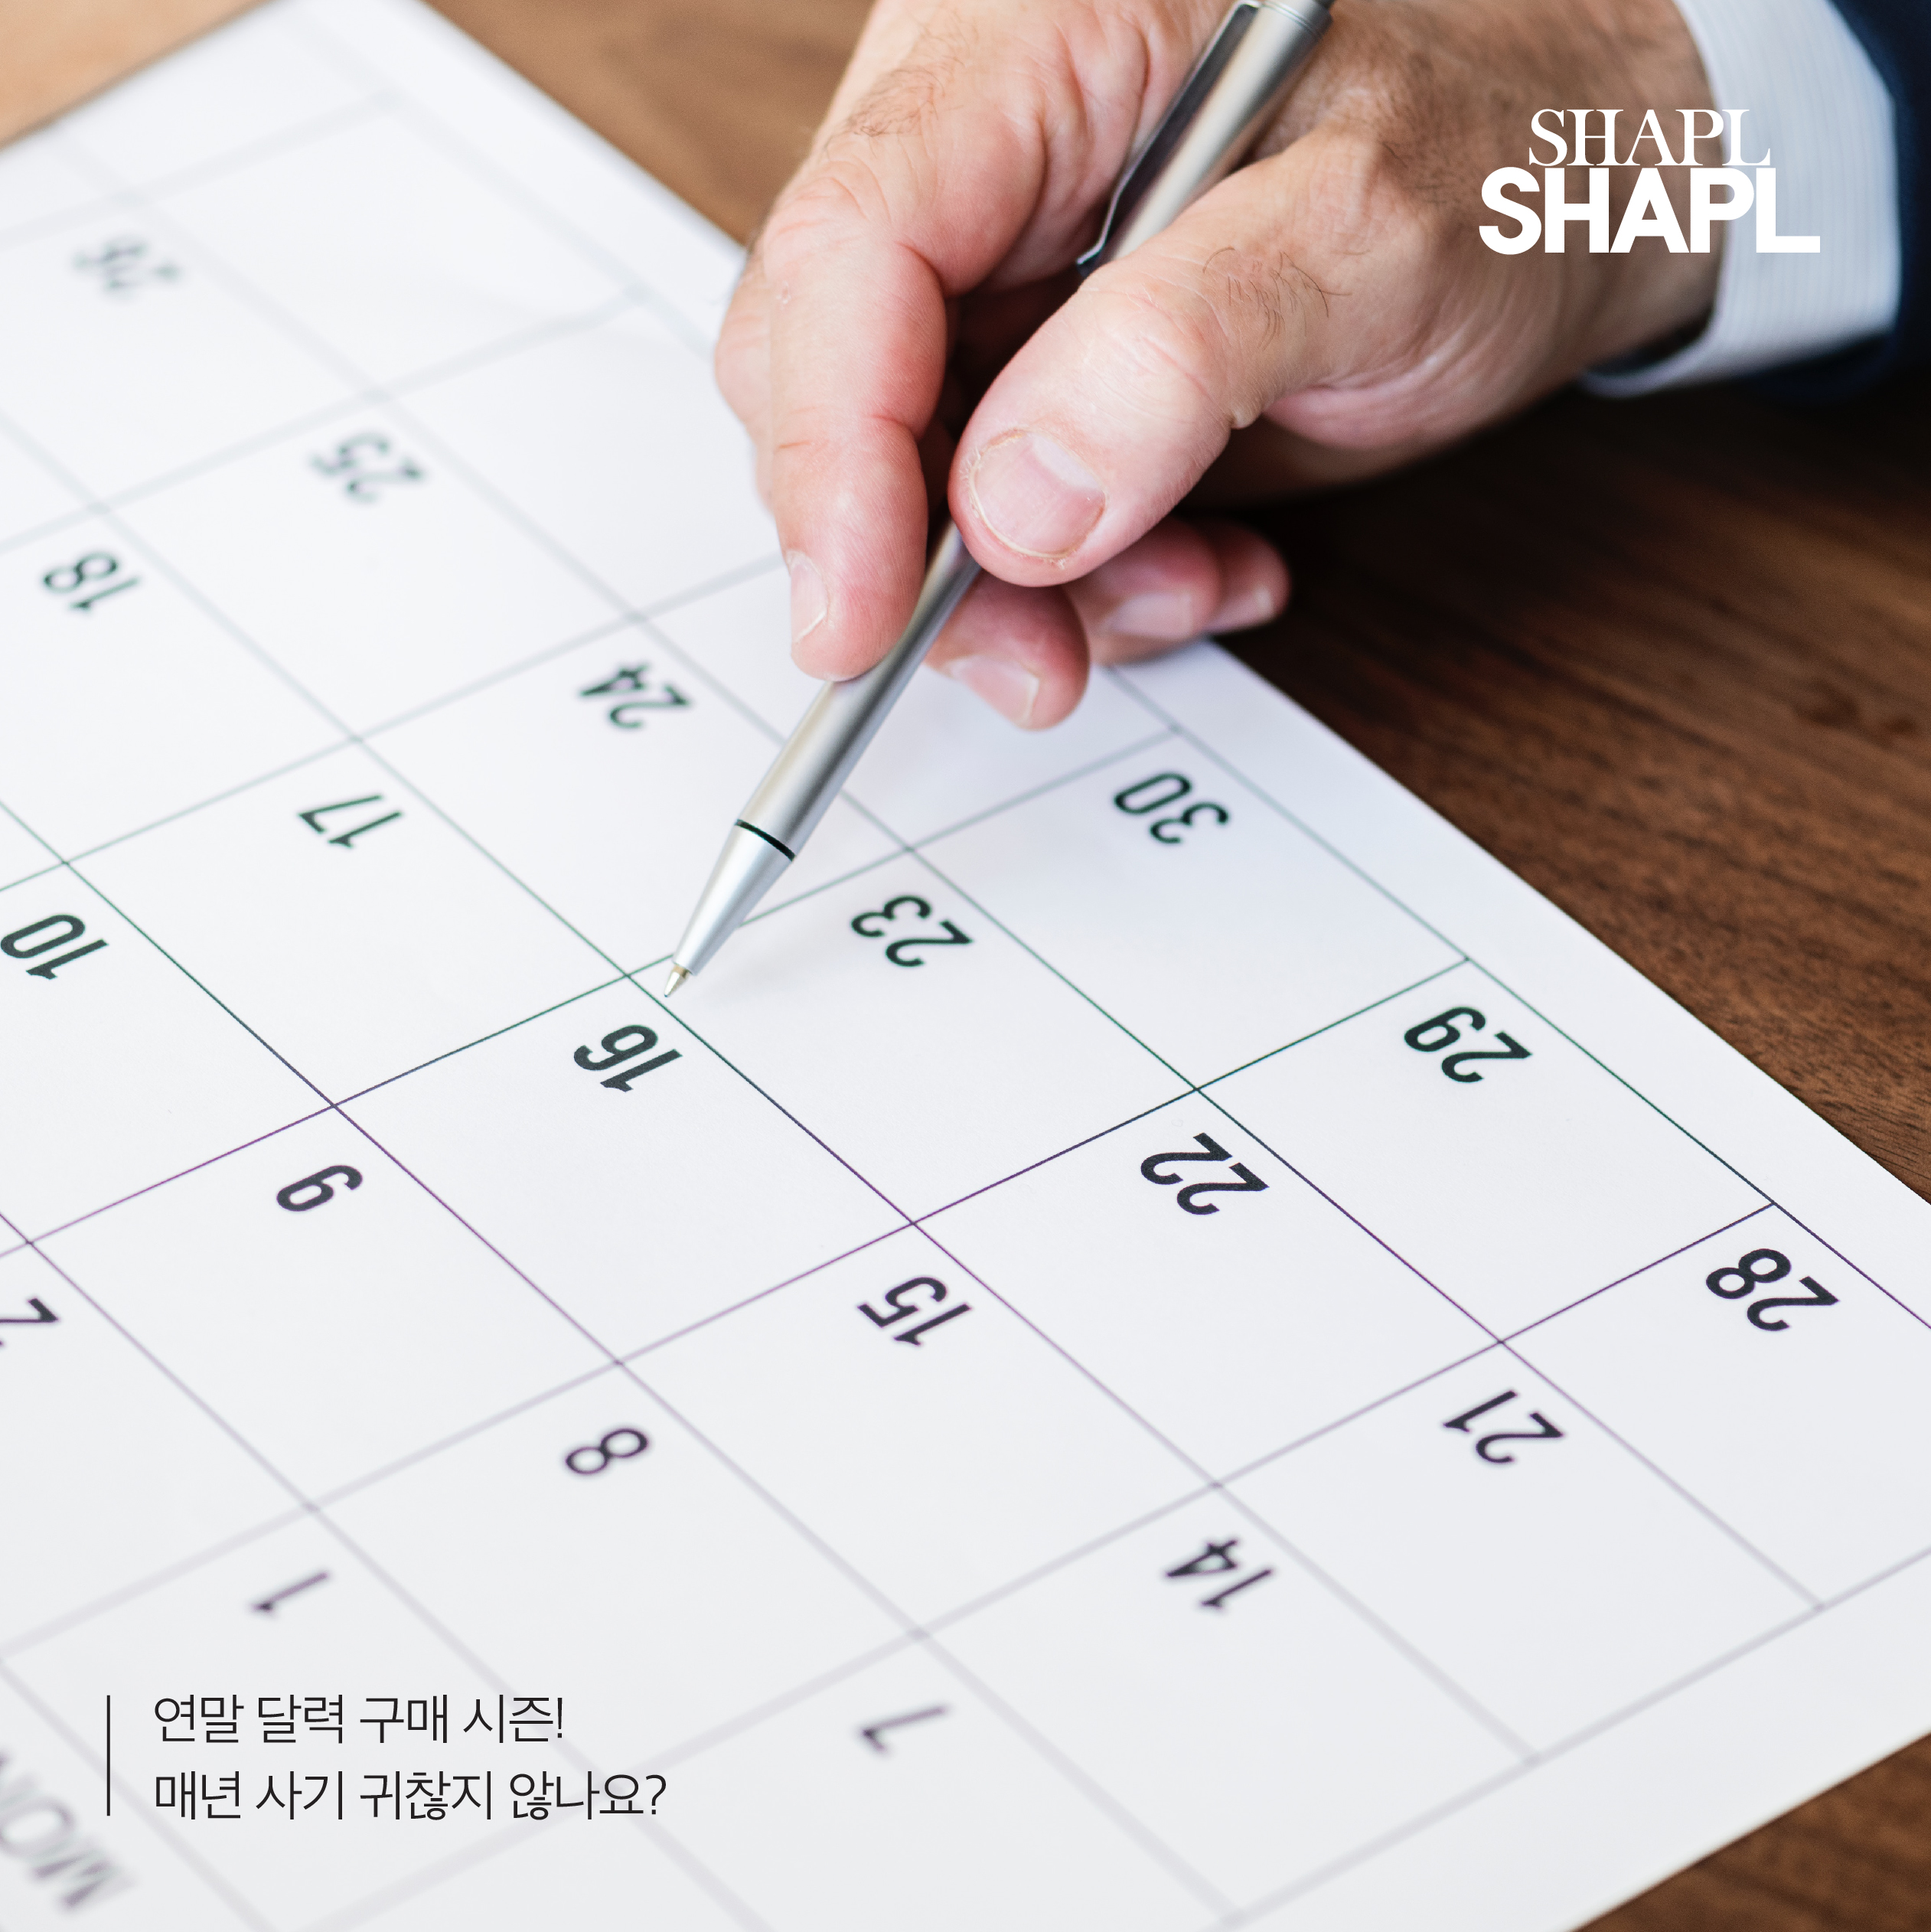 201901/181230_Perpetual_Desk_Calendar_refine_KR_02.jpg